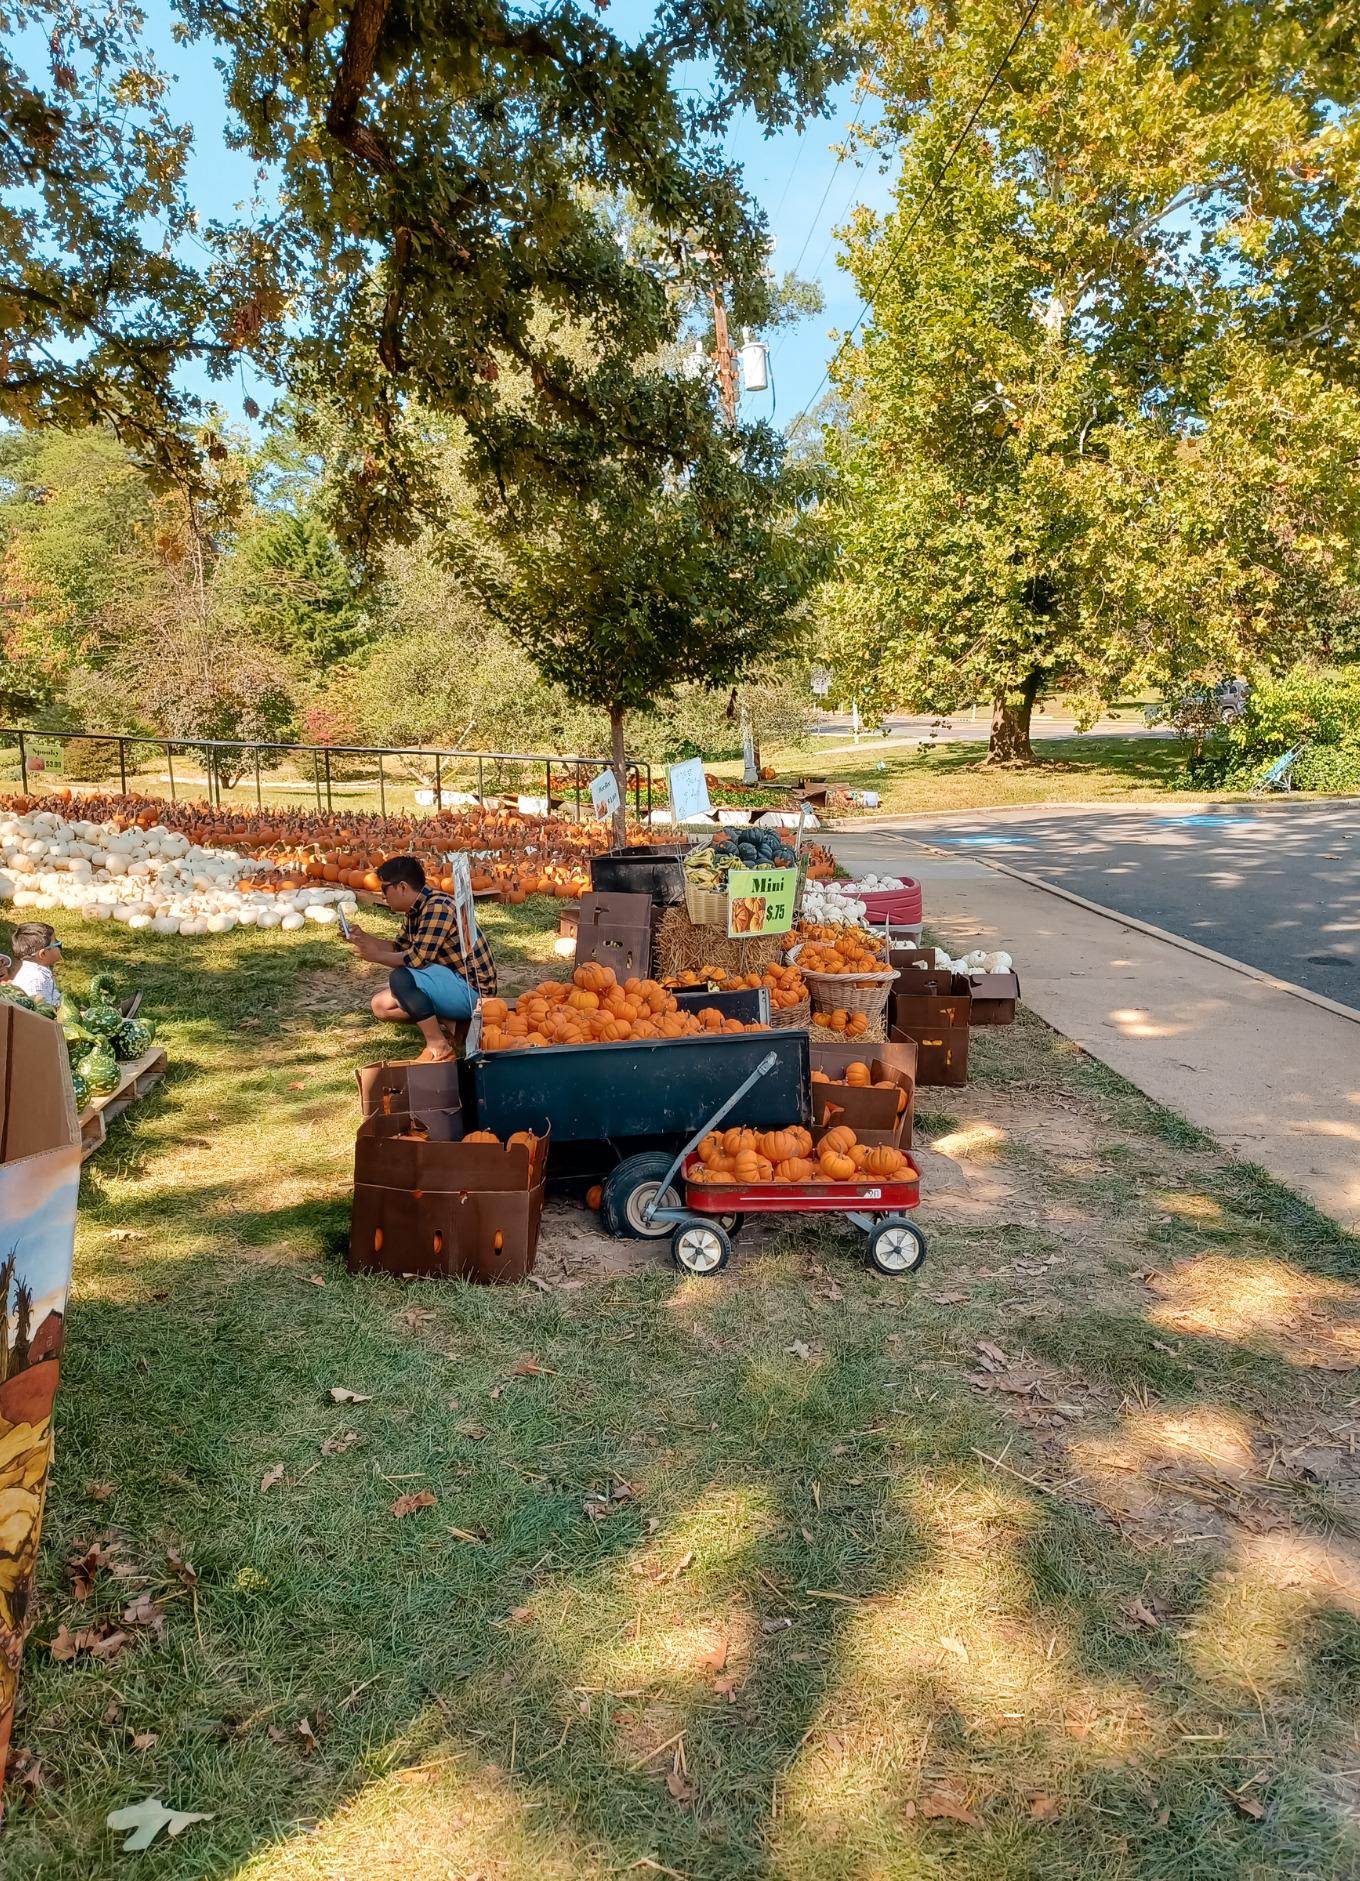 a wagon full of pumpkins in Alexandria, Virginia